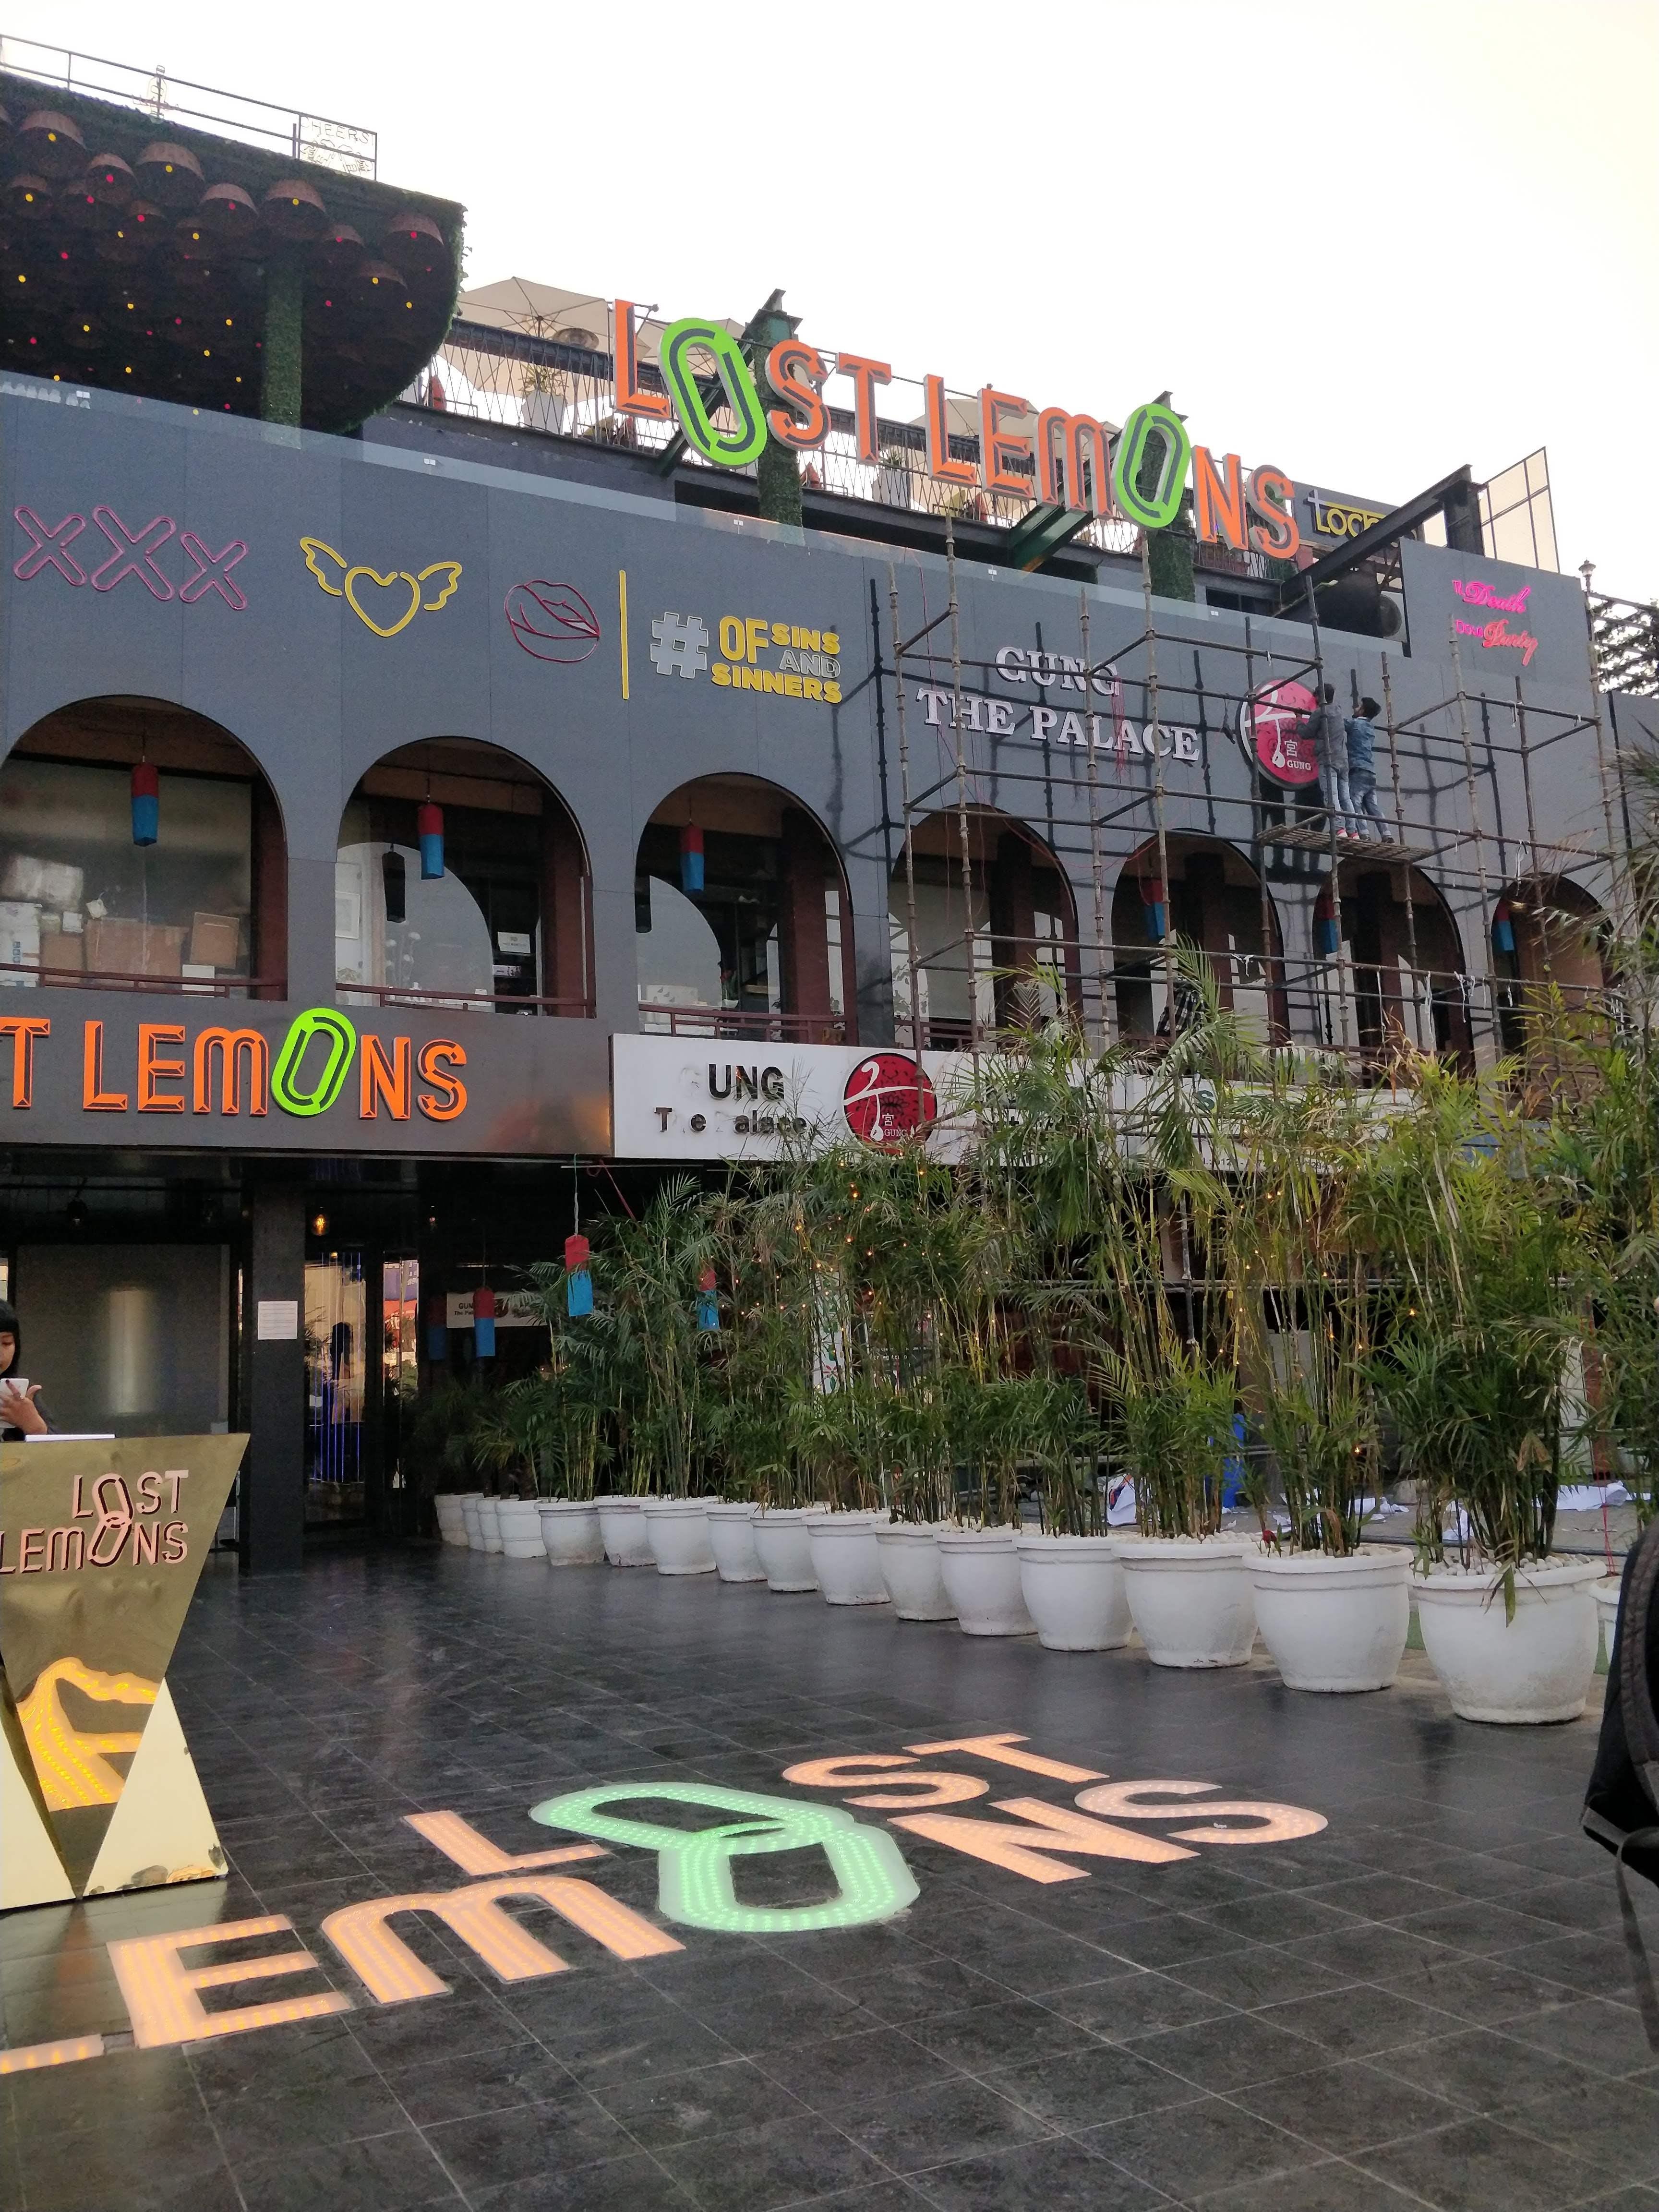 Building,Architecture,Neighbourhood,Mixed-use,Urban design,Facade,City,Street